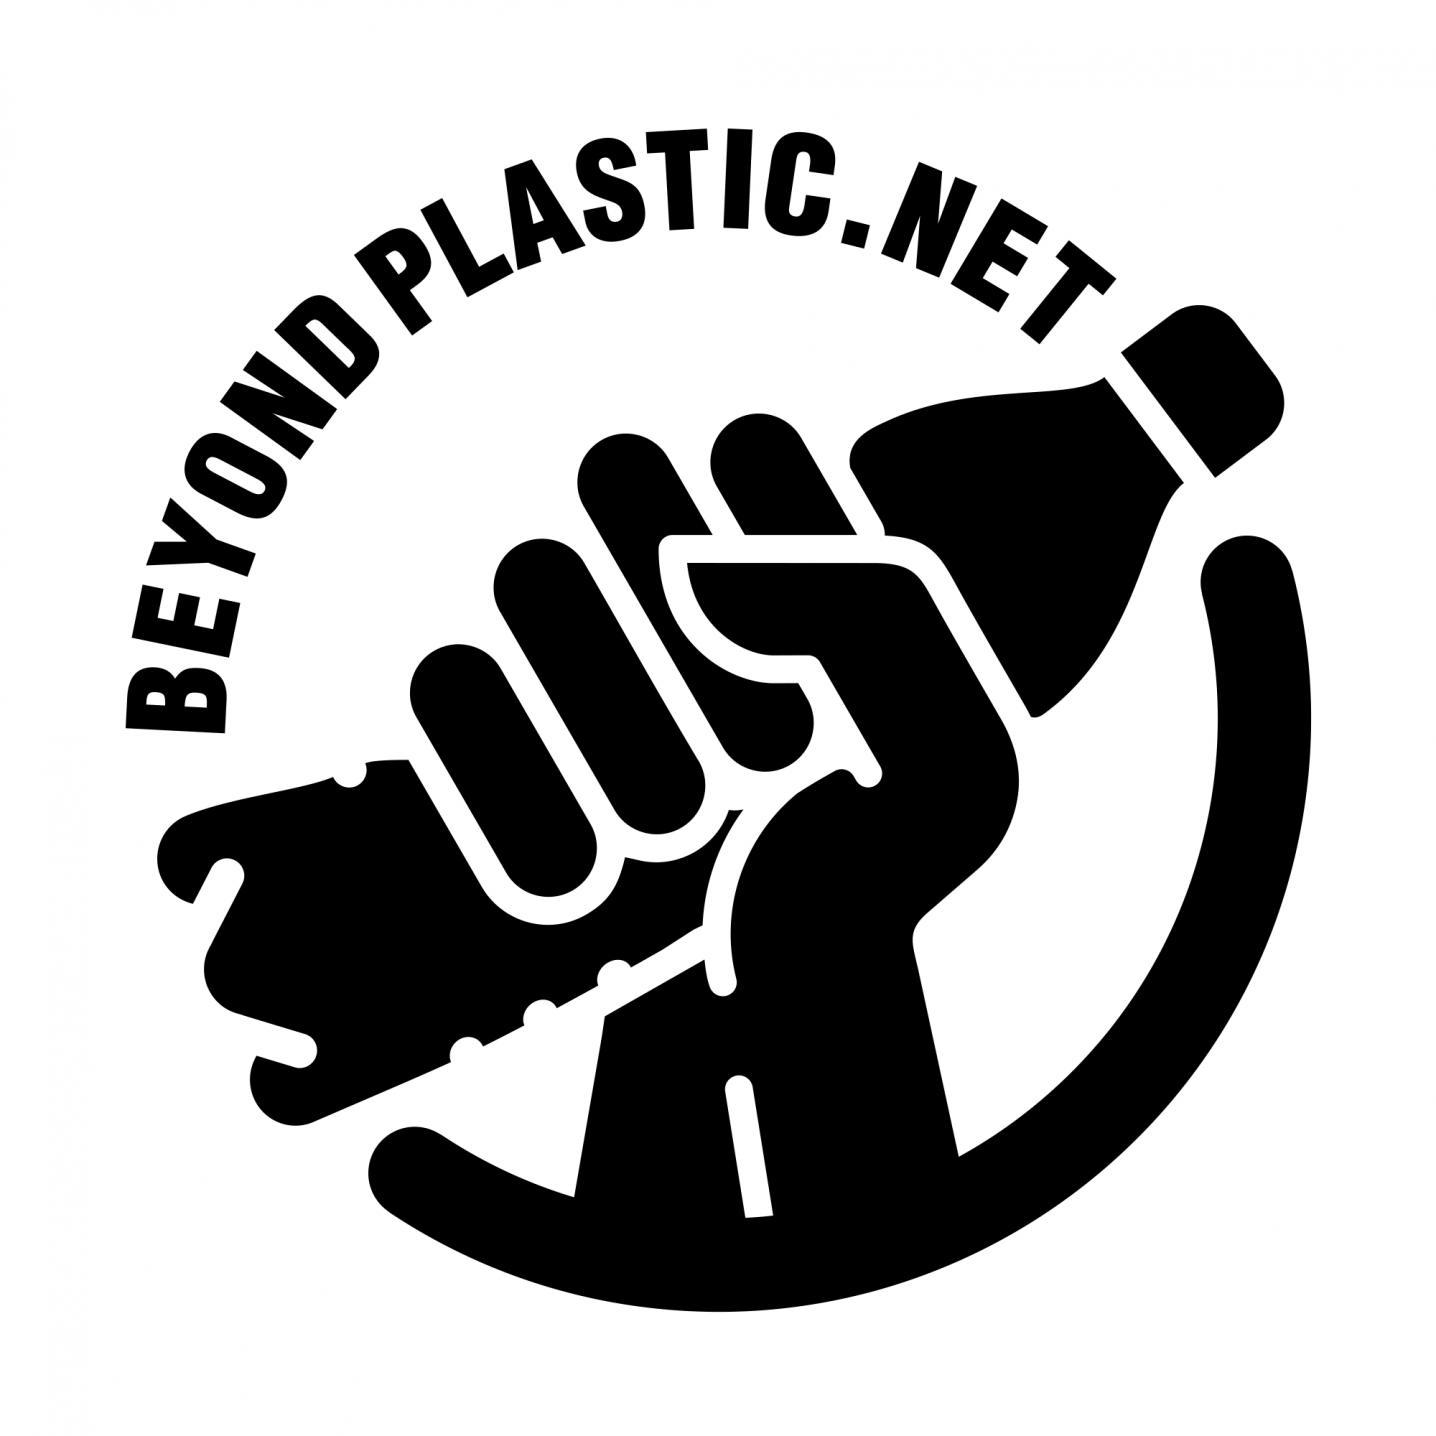 BEYONDPLASTIC.NET Logo